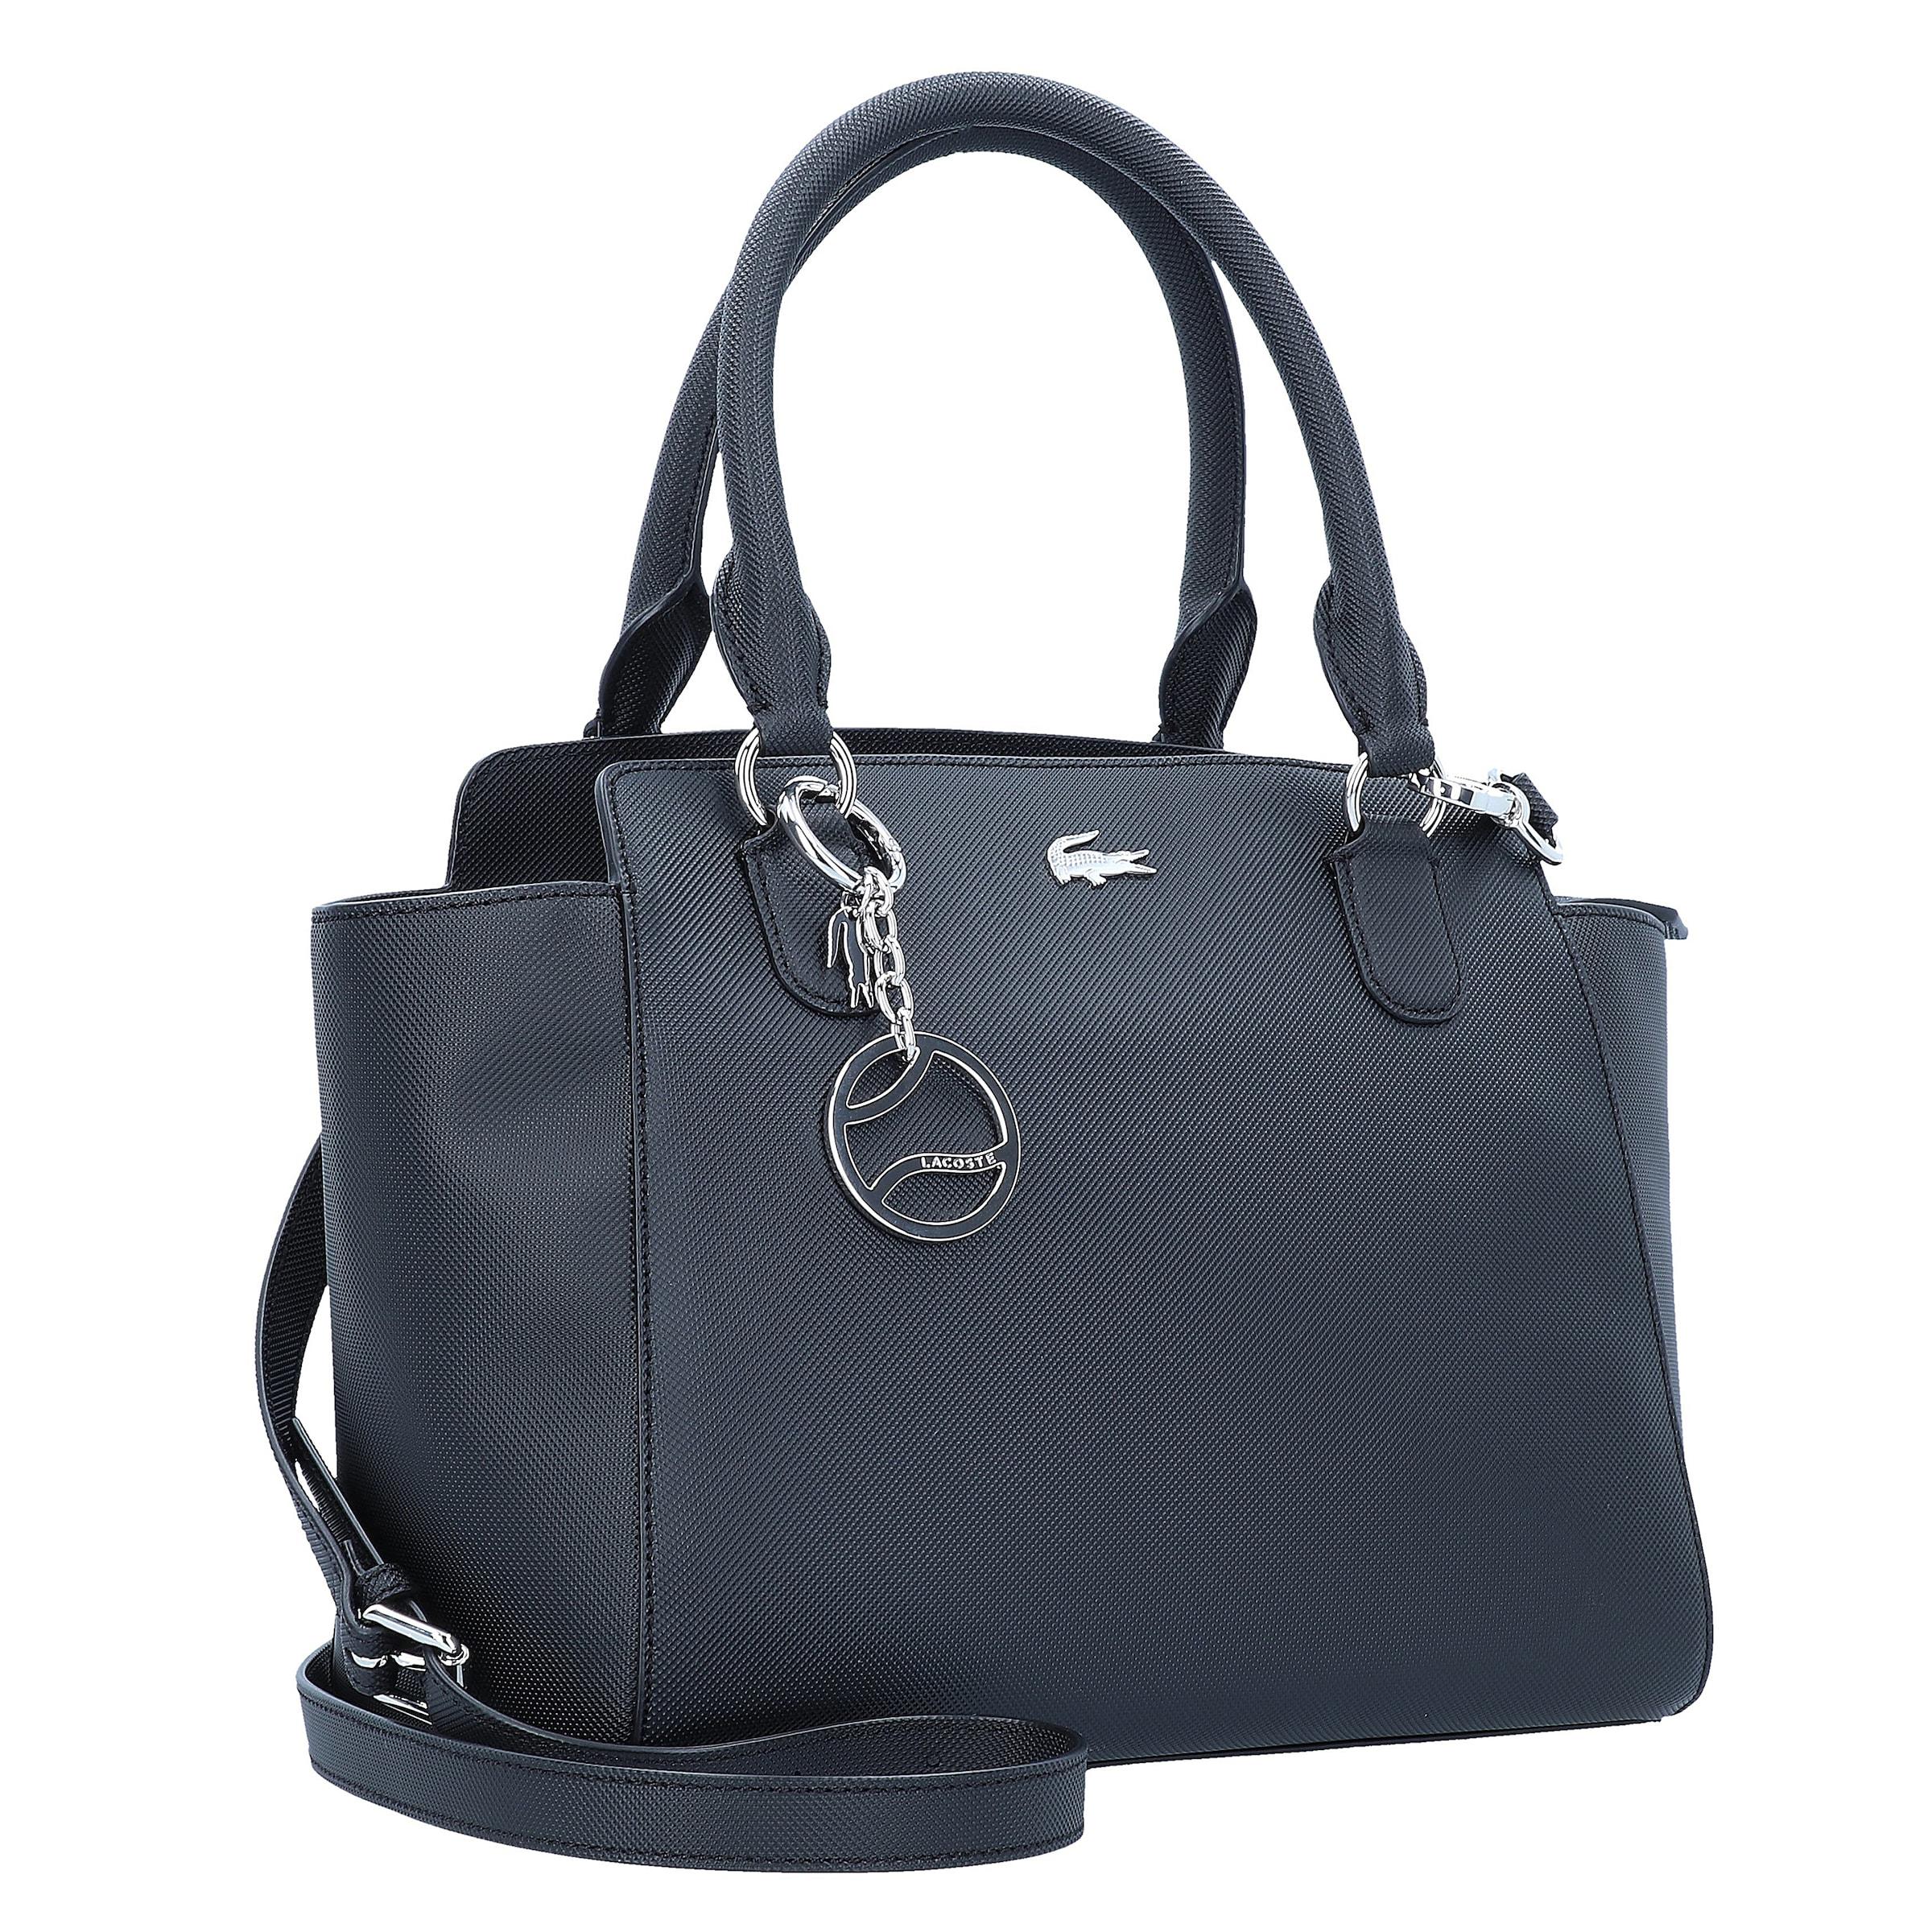 Classic' Lacoste Schwarz Handtasche 'daily In lK1JFc